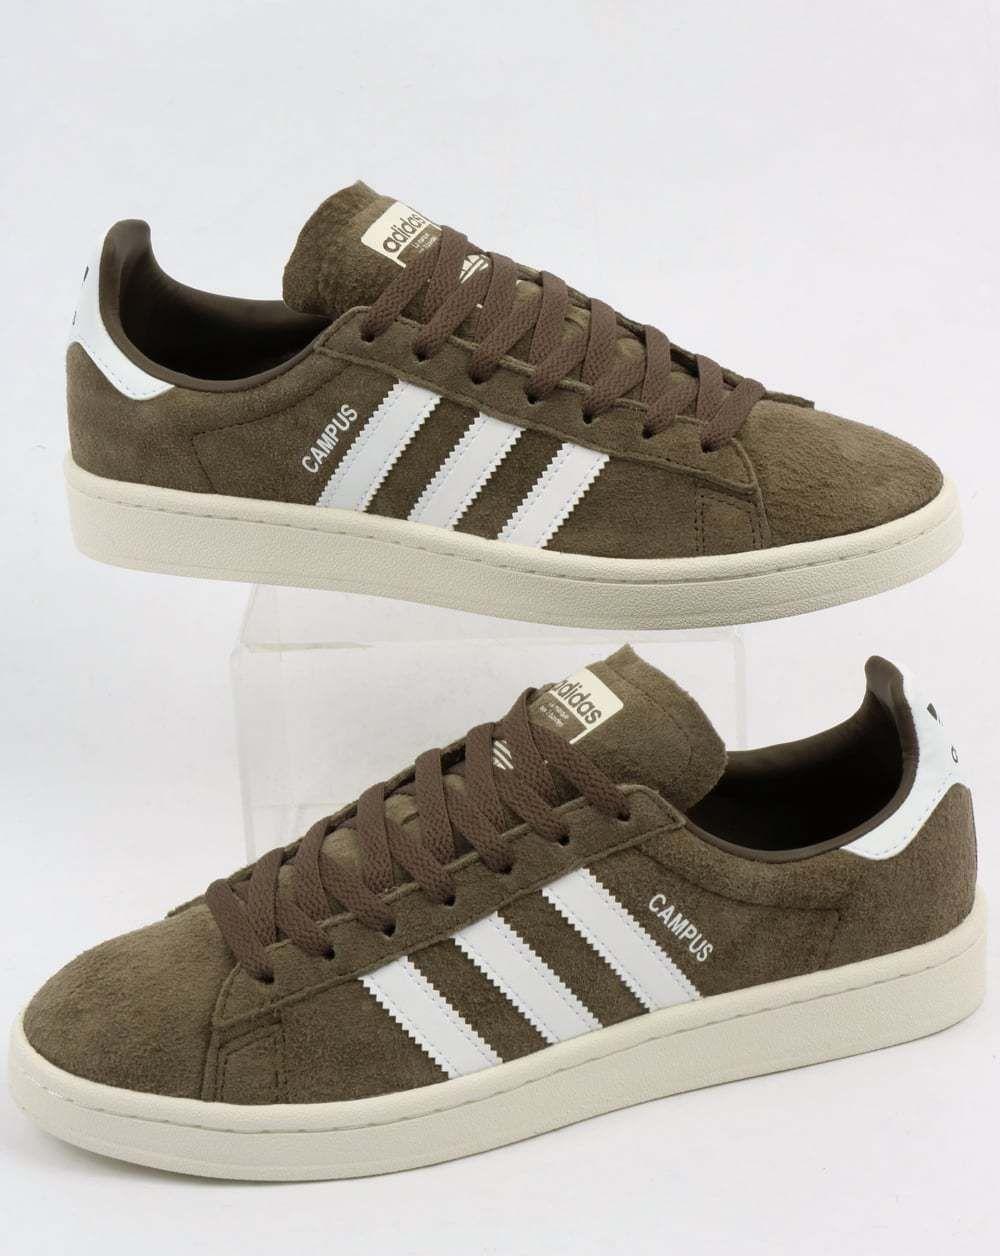 959779de1d1 adidas Campus Trainers in Khaki Green   White suede retro vintage ...